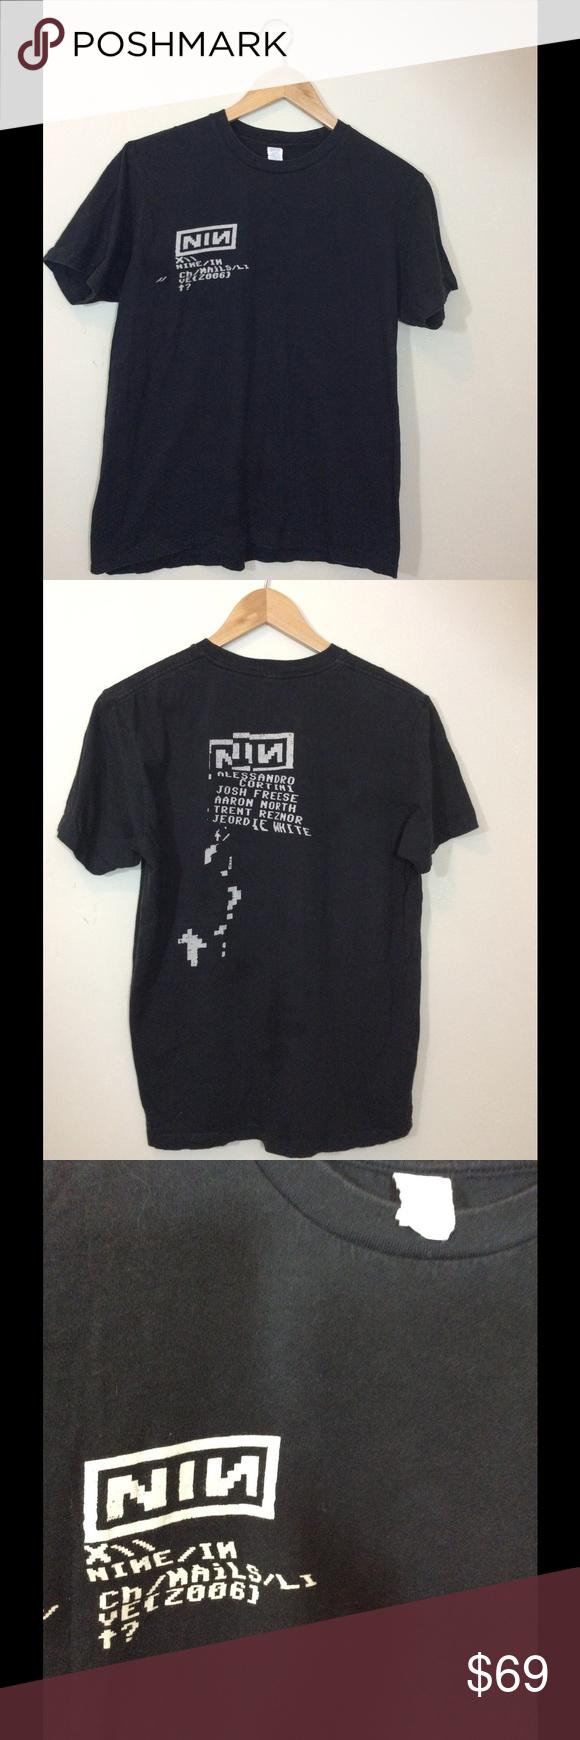 Black Nine Inch Nails NIN Band Vintage T-shirt